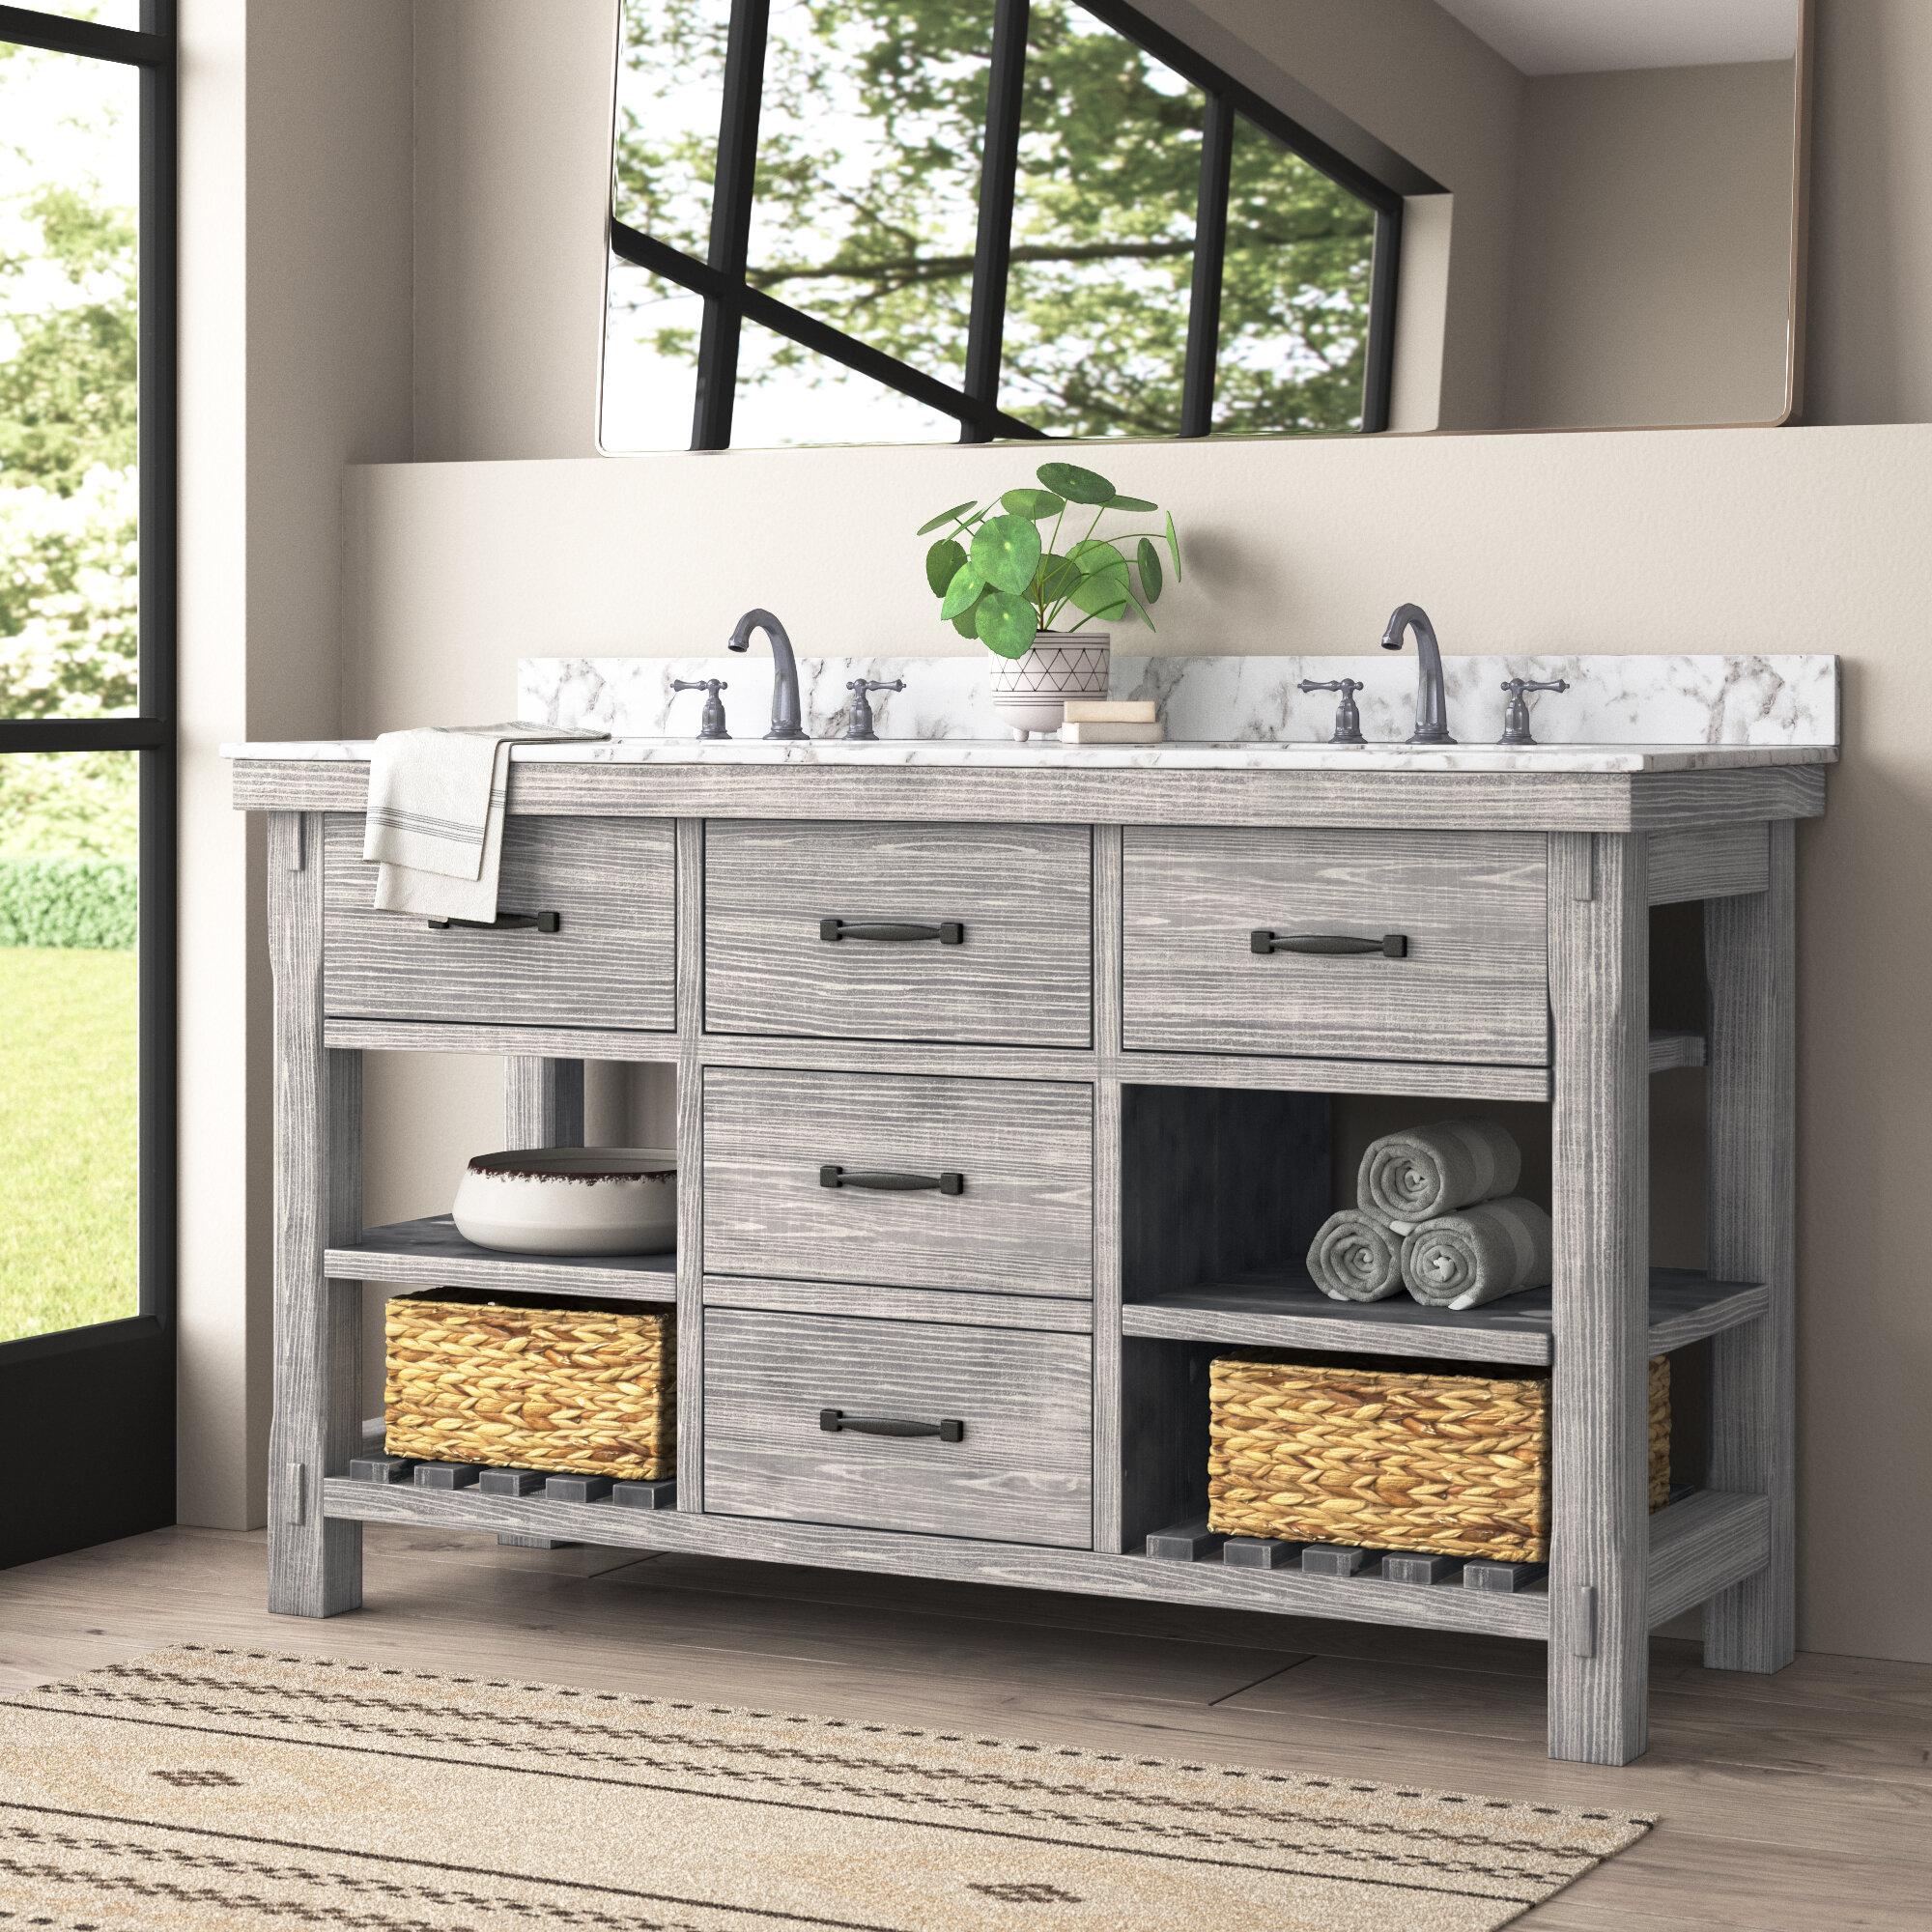 Millwood Pines Villeneuve Rustic Solid Fir 60 Double Bathroom Vanity Set Reviews Wayfair